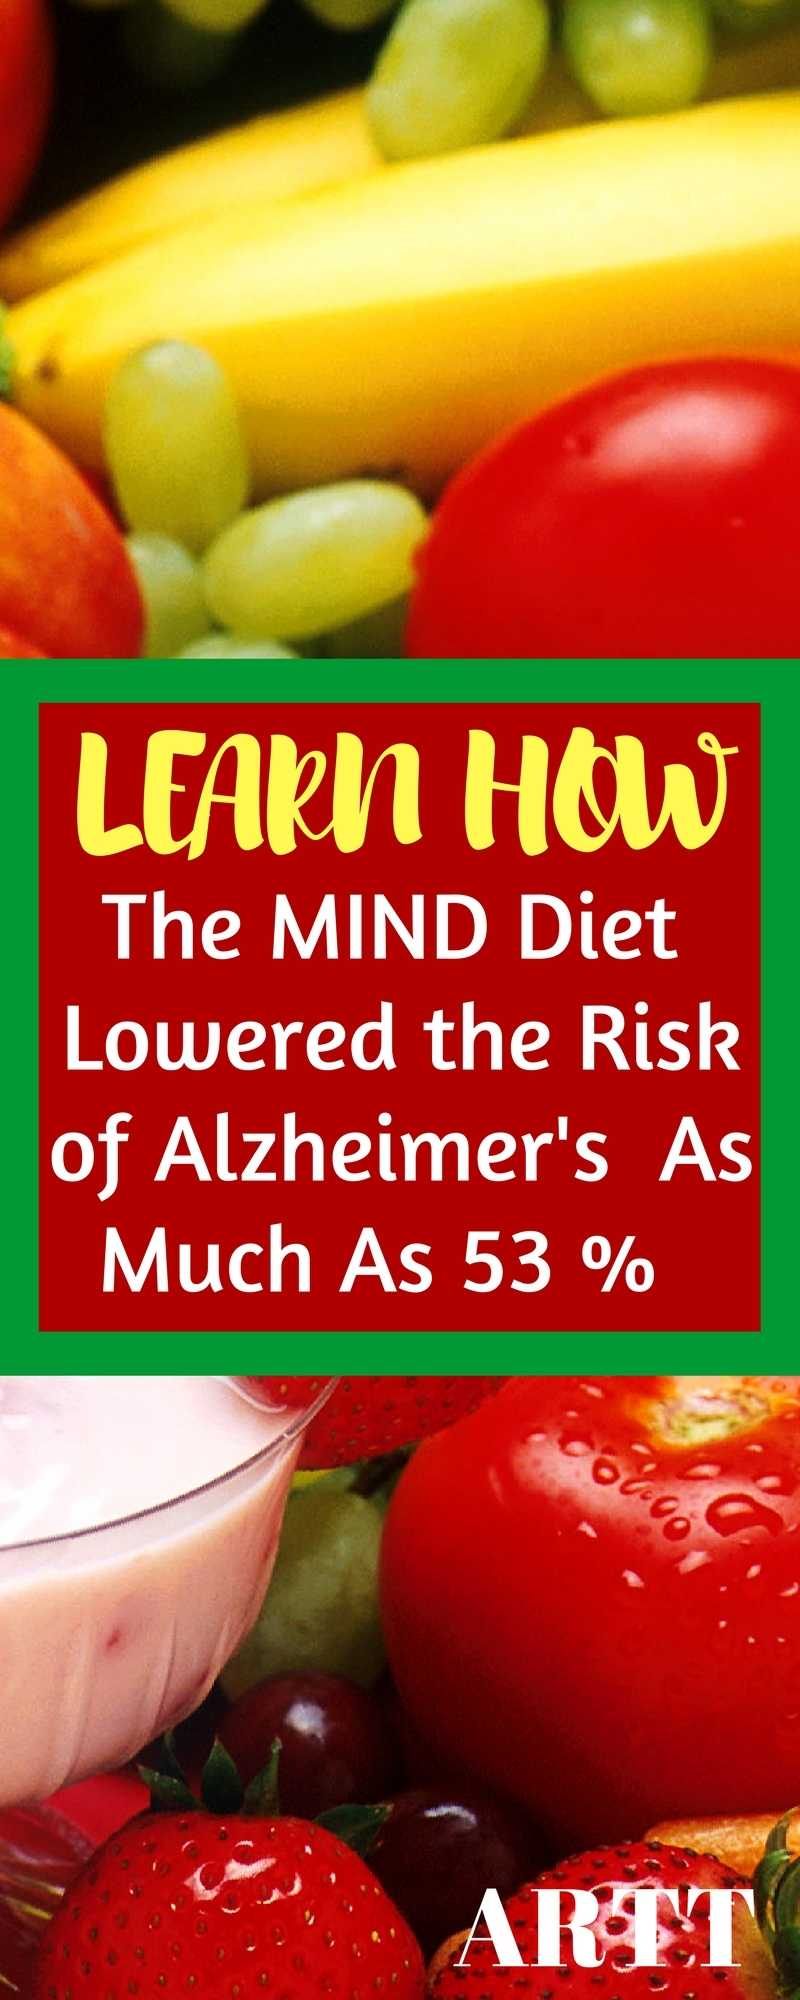 MIND Diet Lowers Risk of Alzheimer's | Alzheimer's | Weight Loss | Weight Loss Foods  | Weight Loss Foods 10 Pounds | Weight Loss Foods Recipes | Fast Weight Loss Foods | Weight Loss Foods Fat Burning Recipes | Weight Loss Foods Diet Plans | Diet Plans | ARoadtoTravel.com